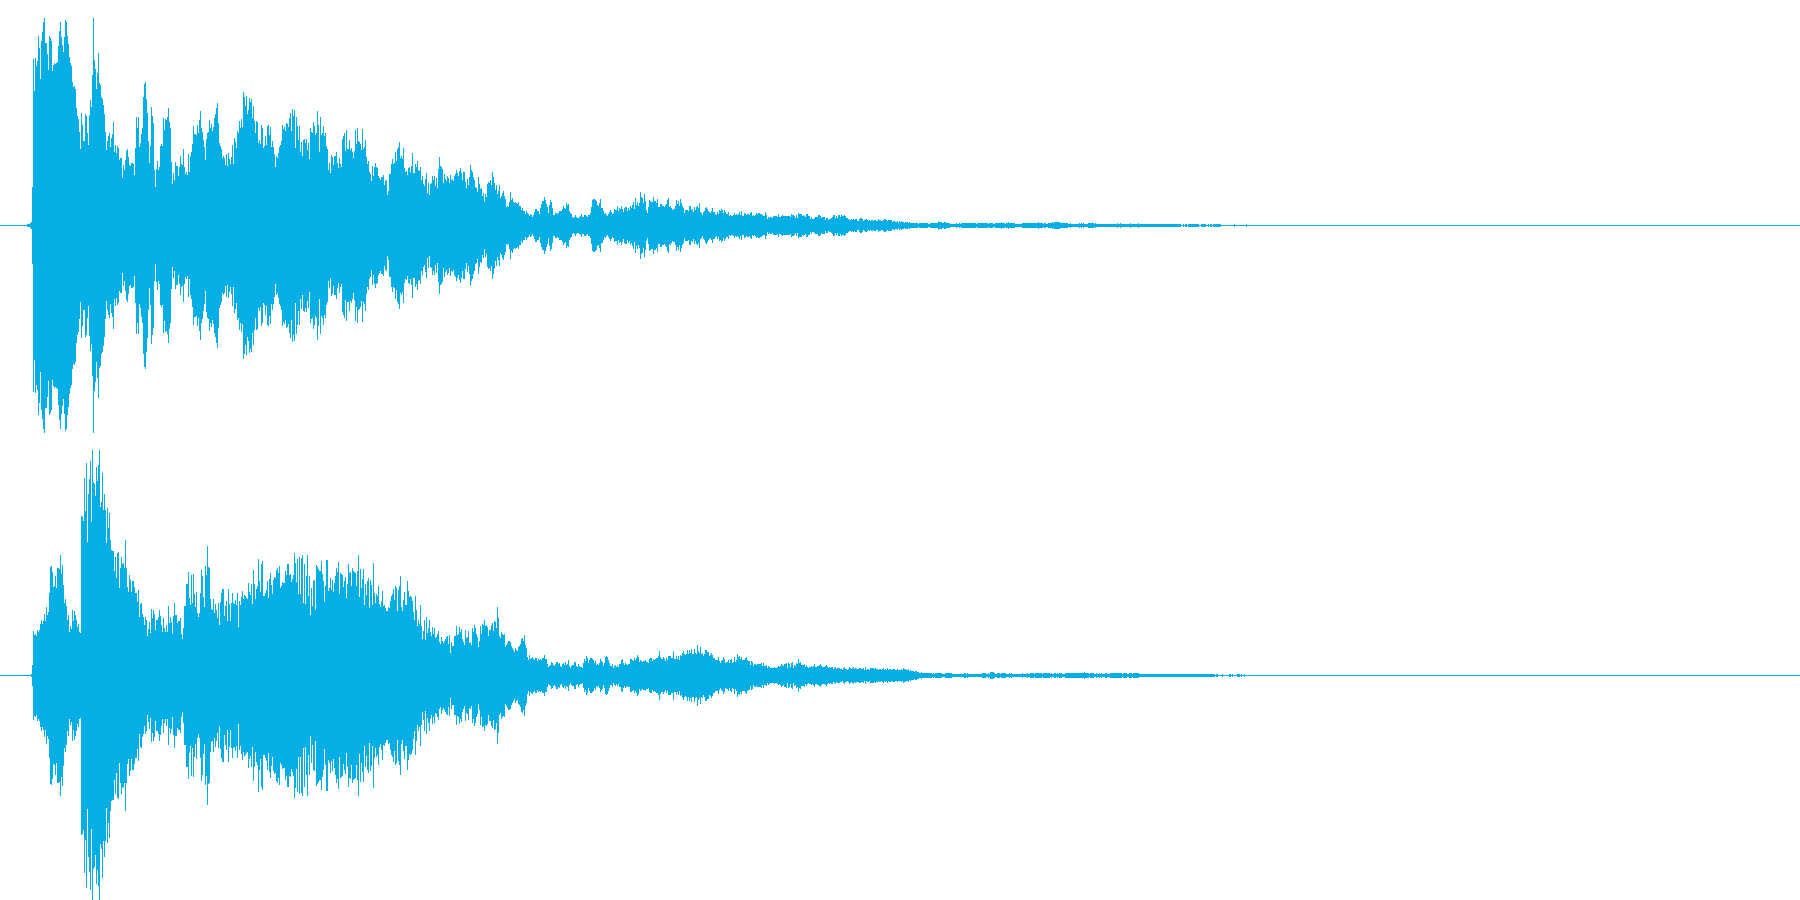 【SE】決定音02(ピローン↓)の再生済みの波形